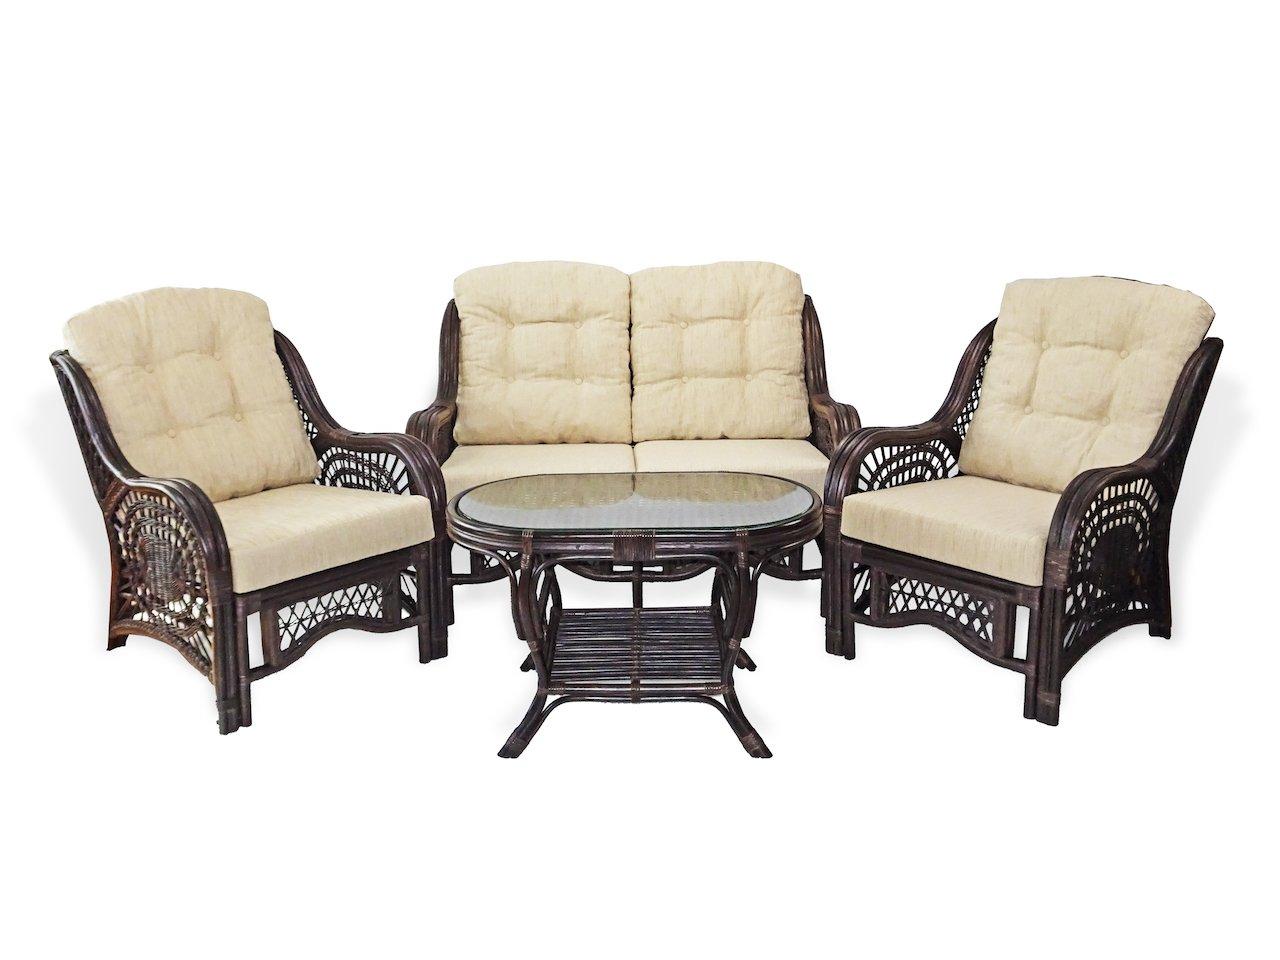 Malibu Lounge Set of 2 Natural Rattan Wicker Chairs, Loveseat with Cream Cushion and Coffee Table w/Glass Handmade, Dark Brown